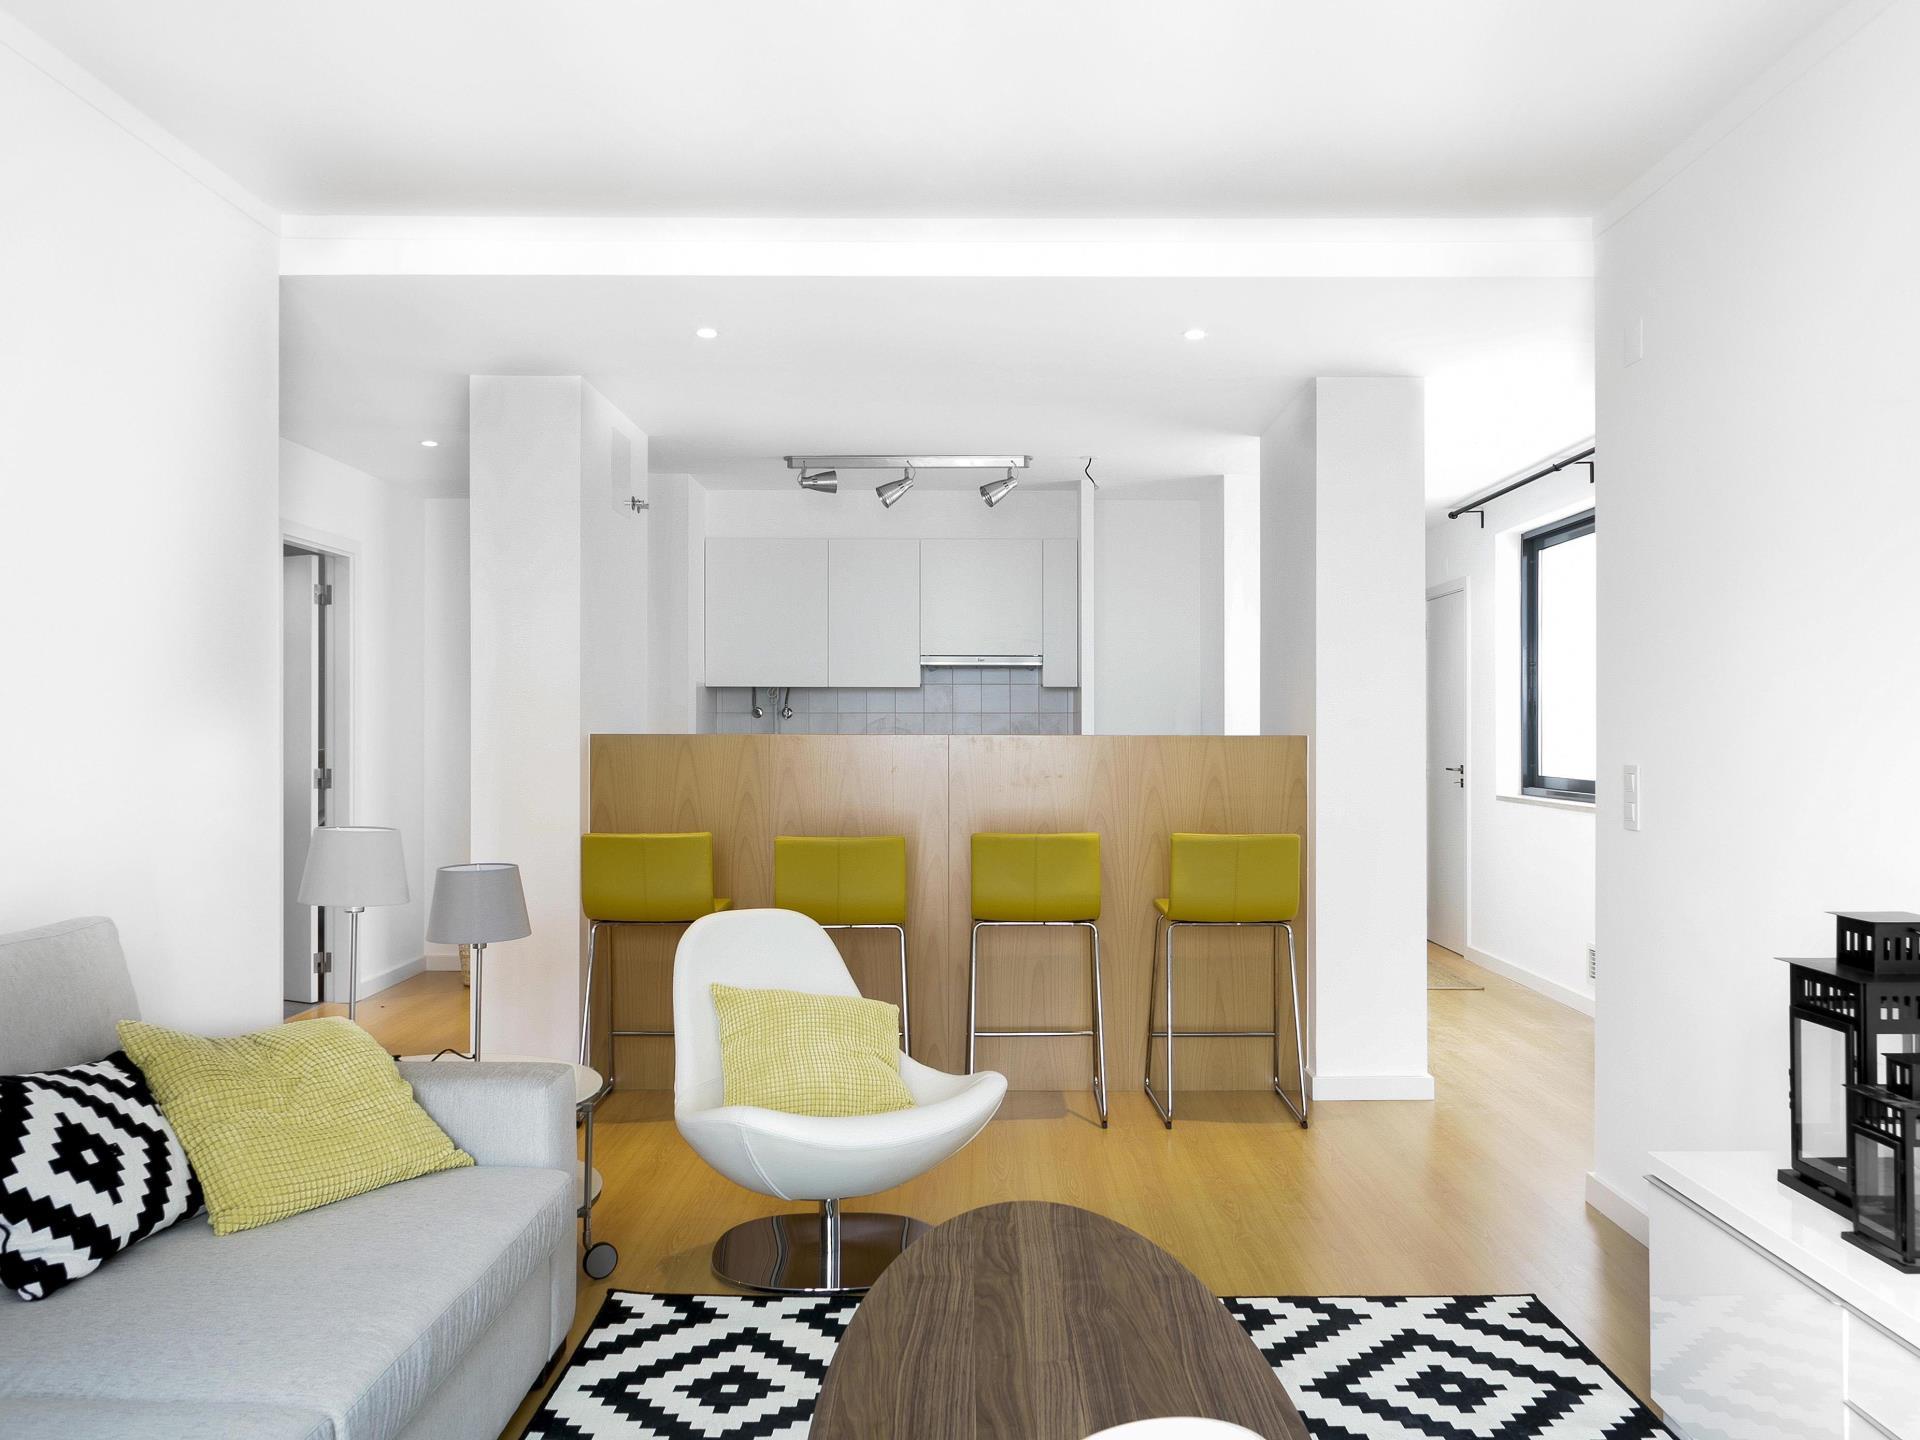 Apartment for Sale at Flat, 2 bedrooms, for Sale Baixa, Lisboa, Lisboa Portugal